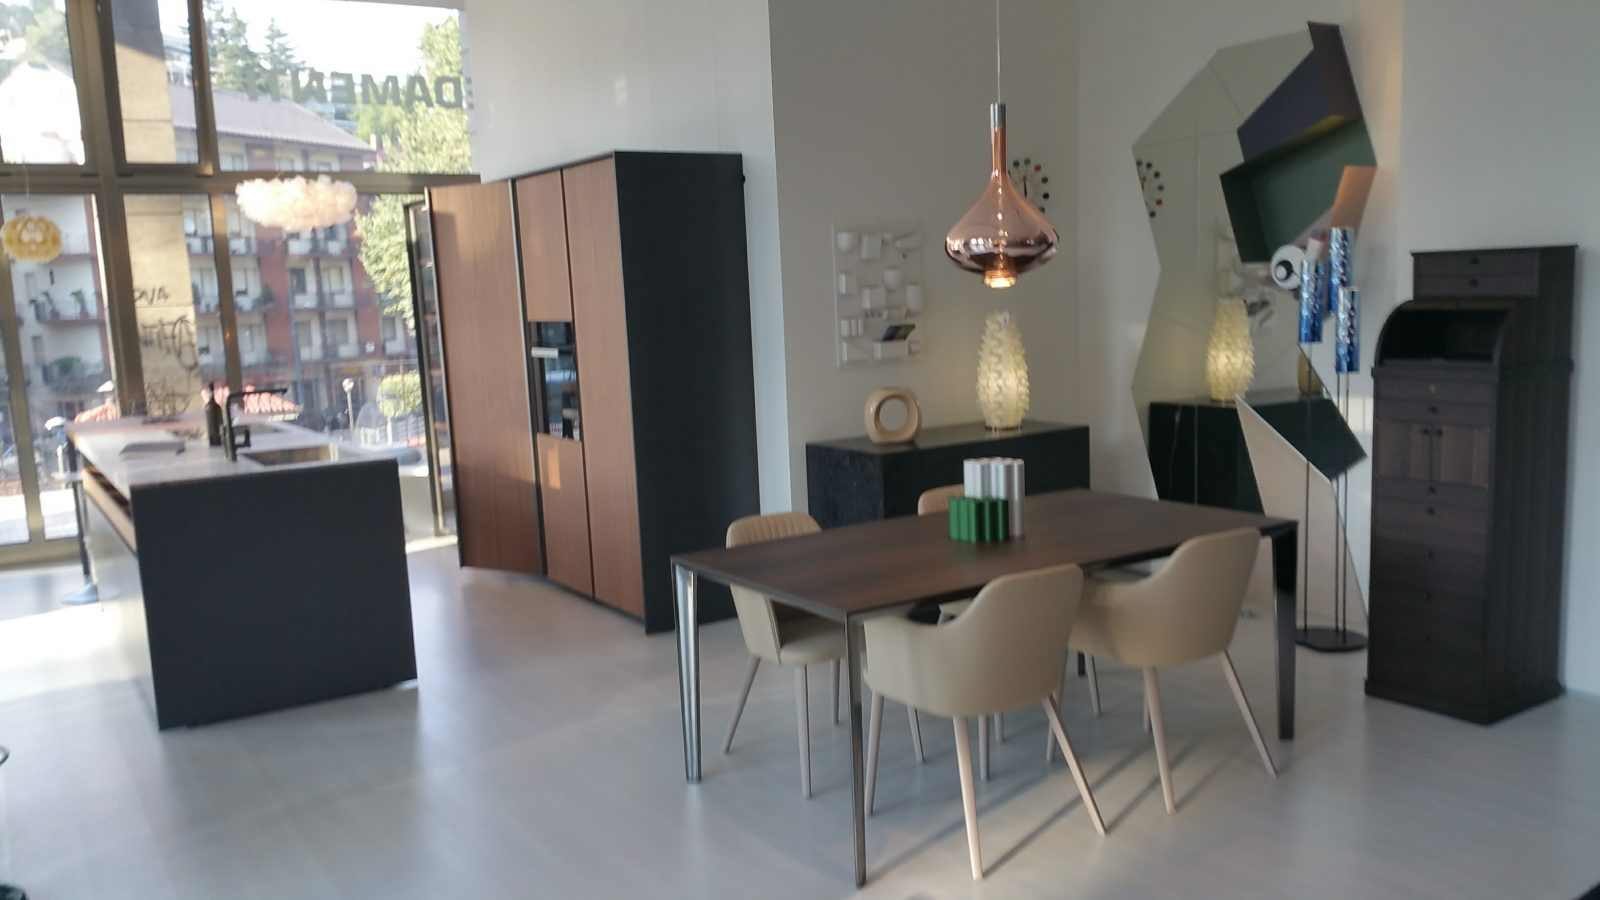 Cucina DADA mod VVD  Onsite design